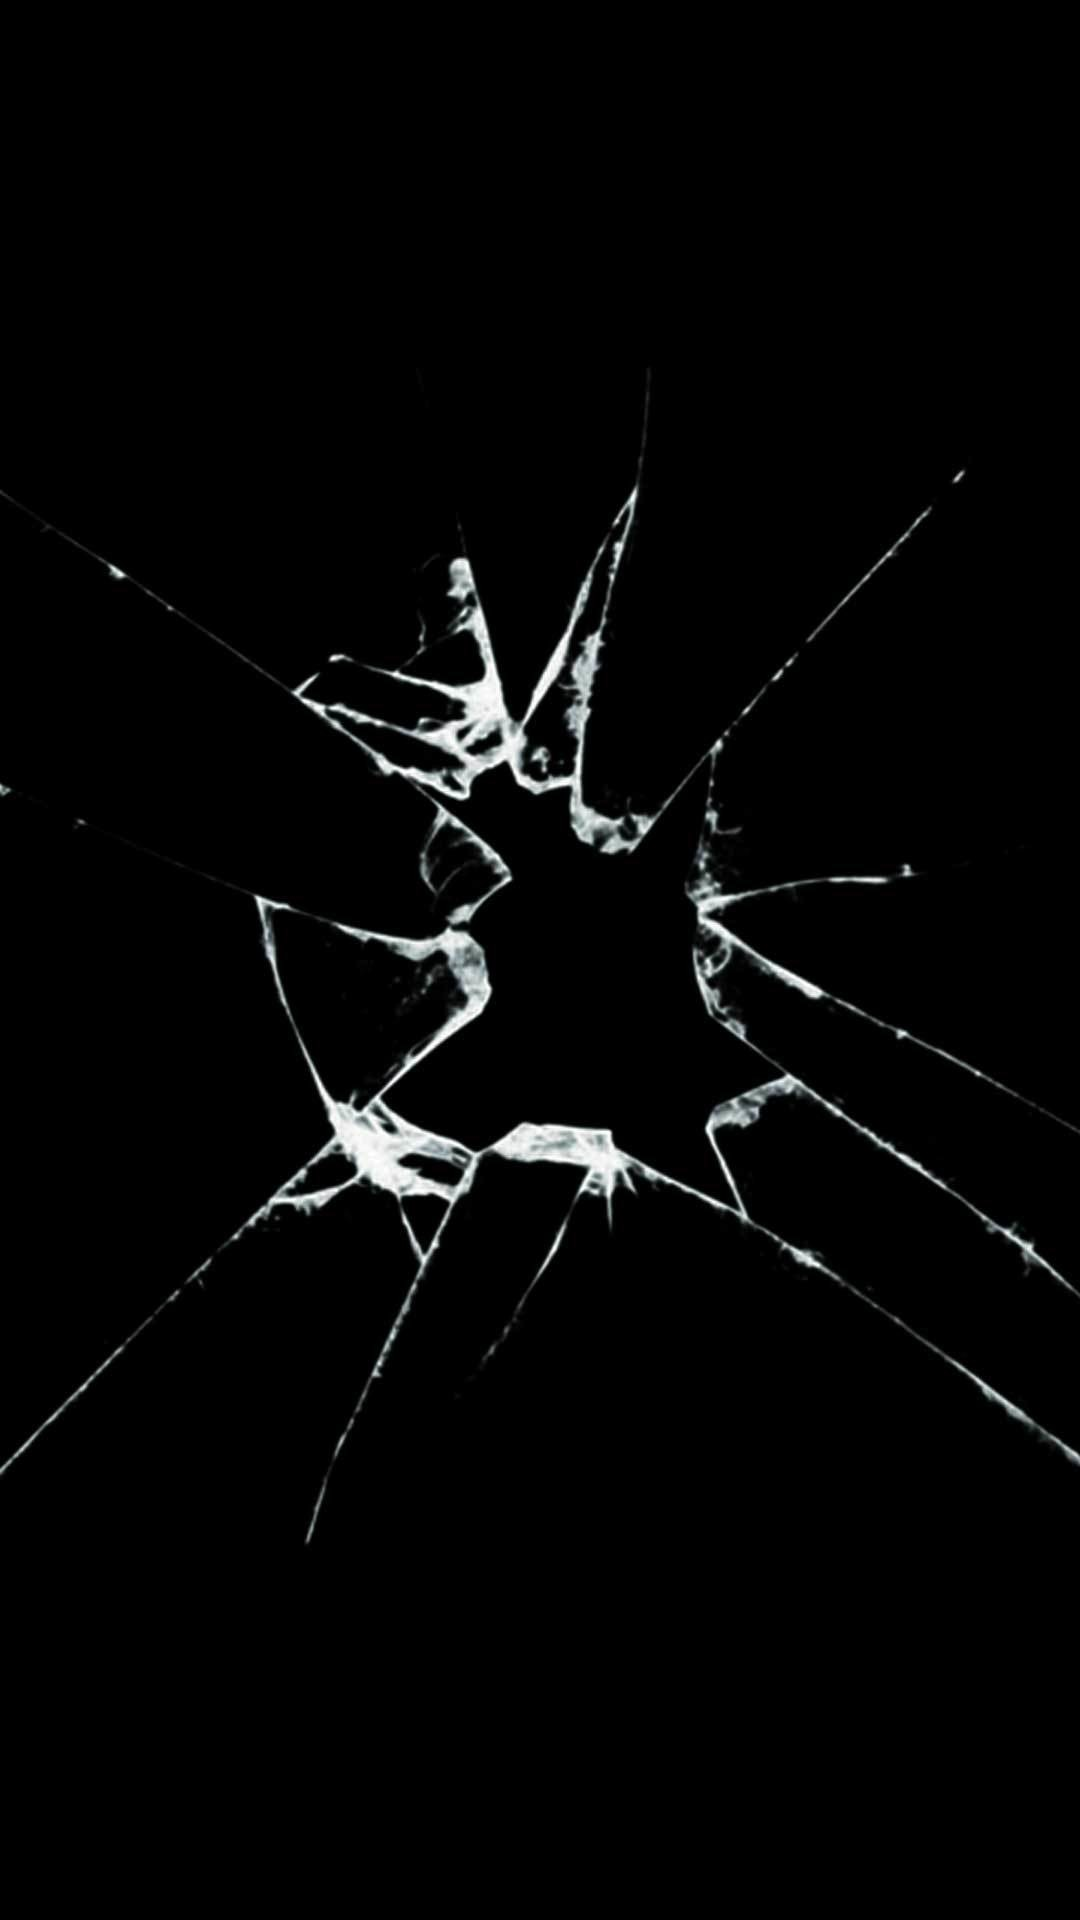 crack screen iphone wallpaper